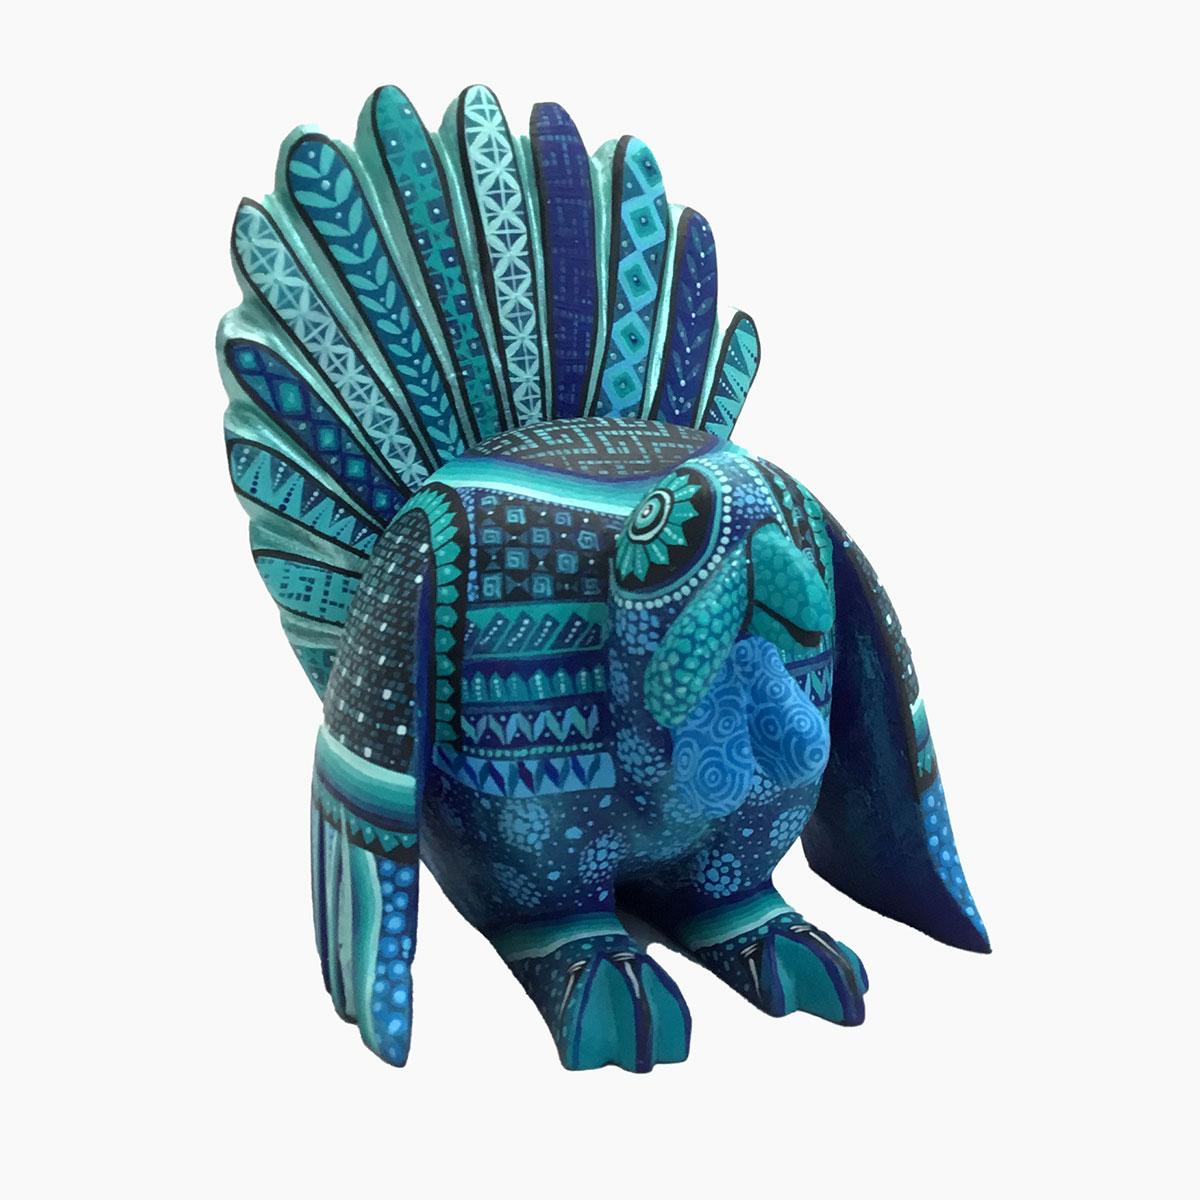 Ivan Fuentes & Mayte Calvo Ivan Fuentes & Mayte Calvo: Blue Turkey Birds